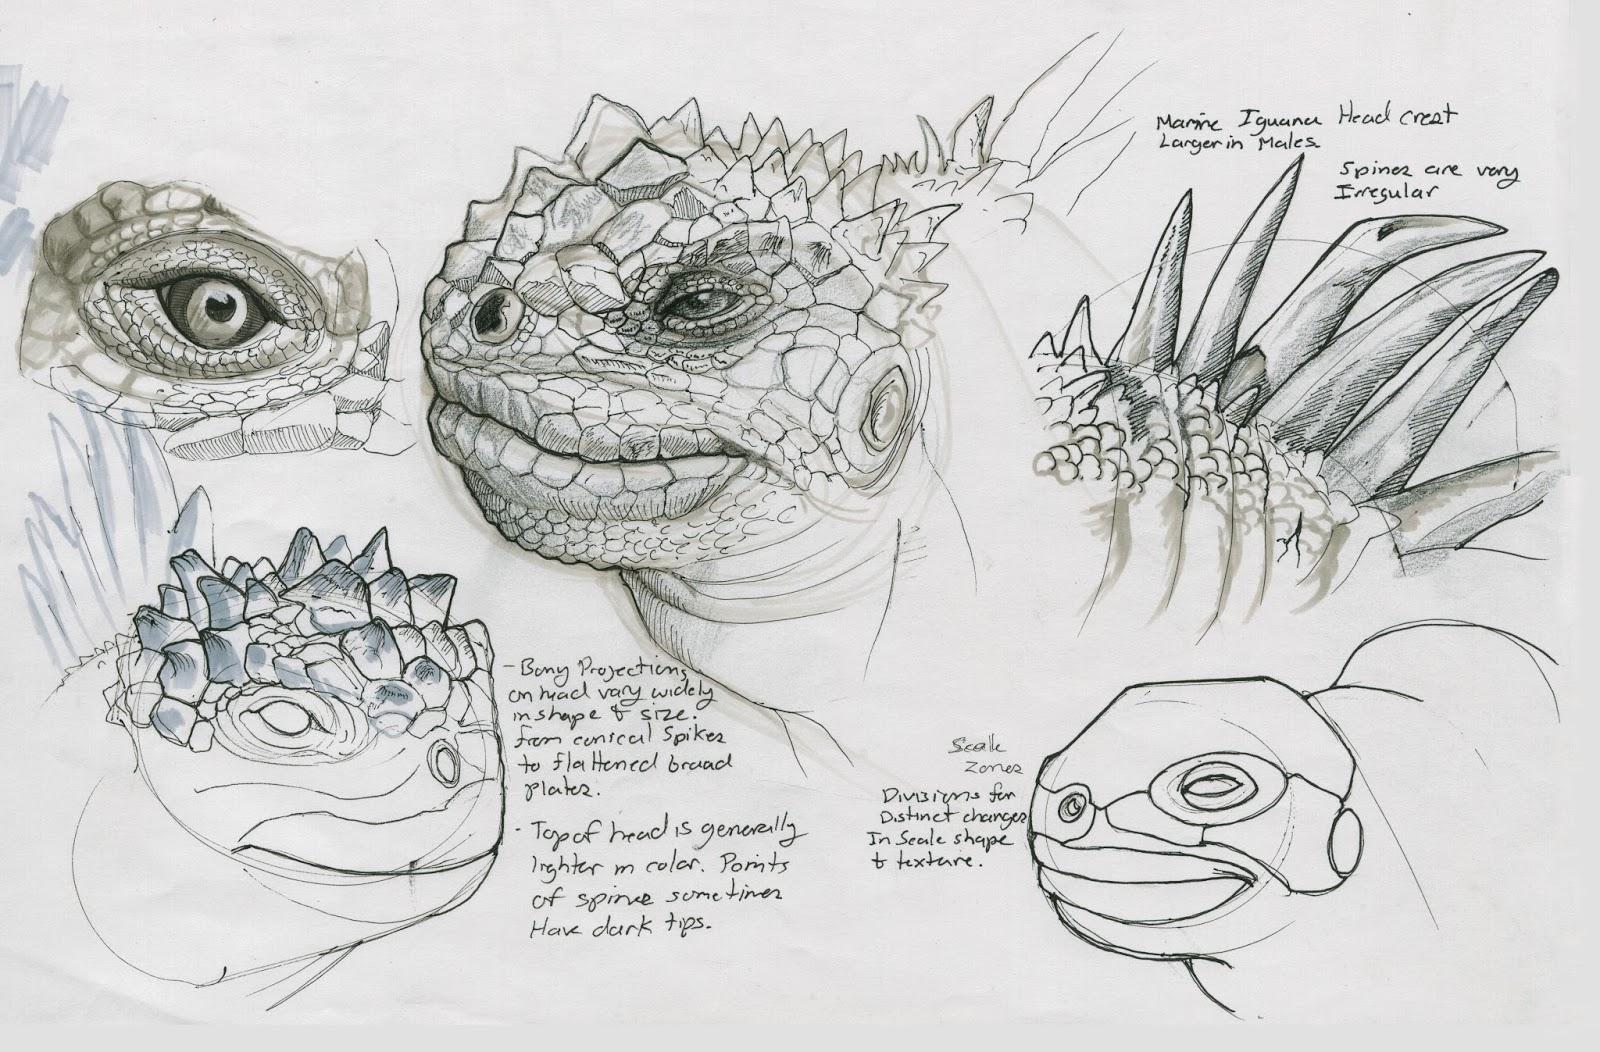 galapagos iguanas coloring pages - photo #35